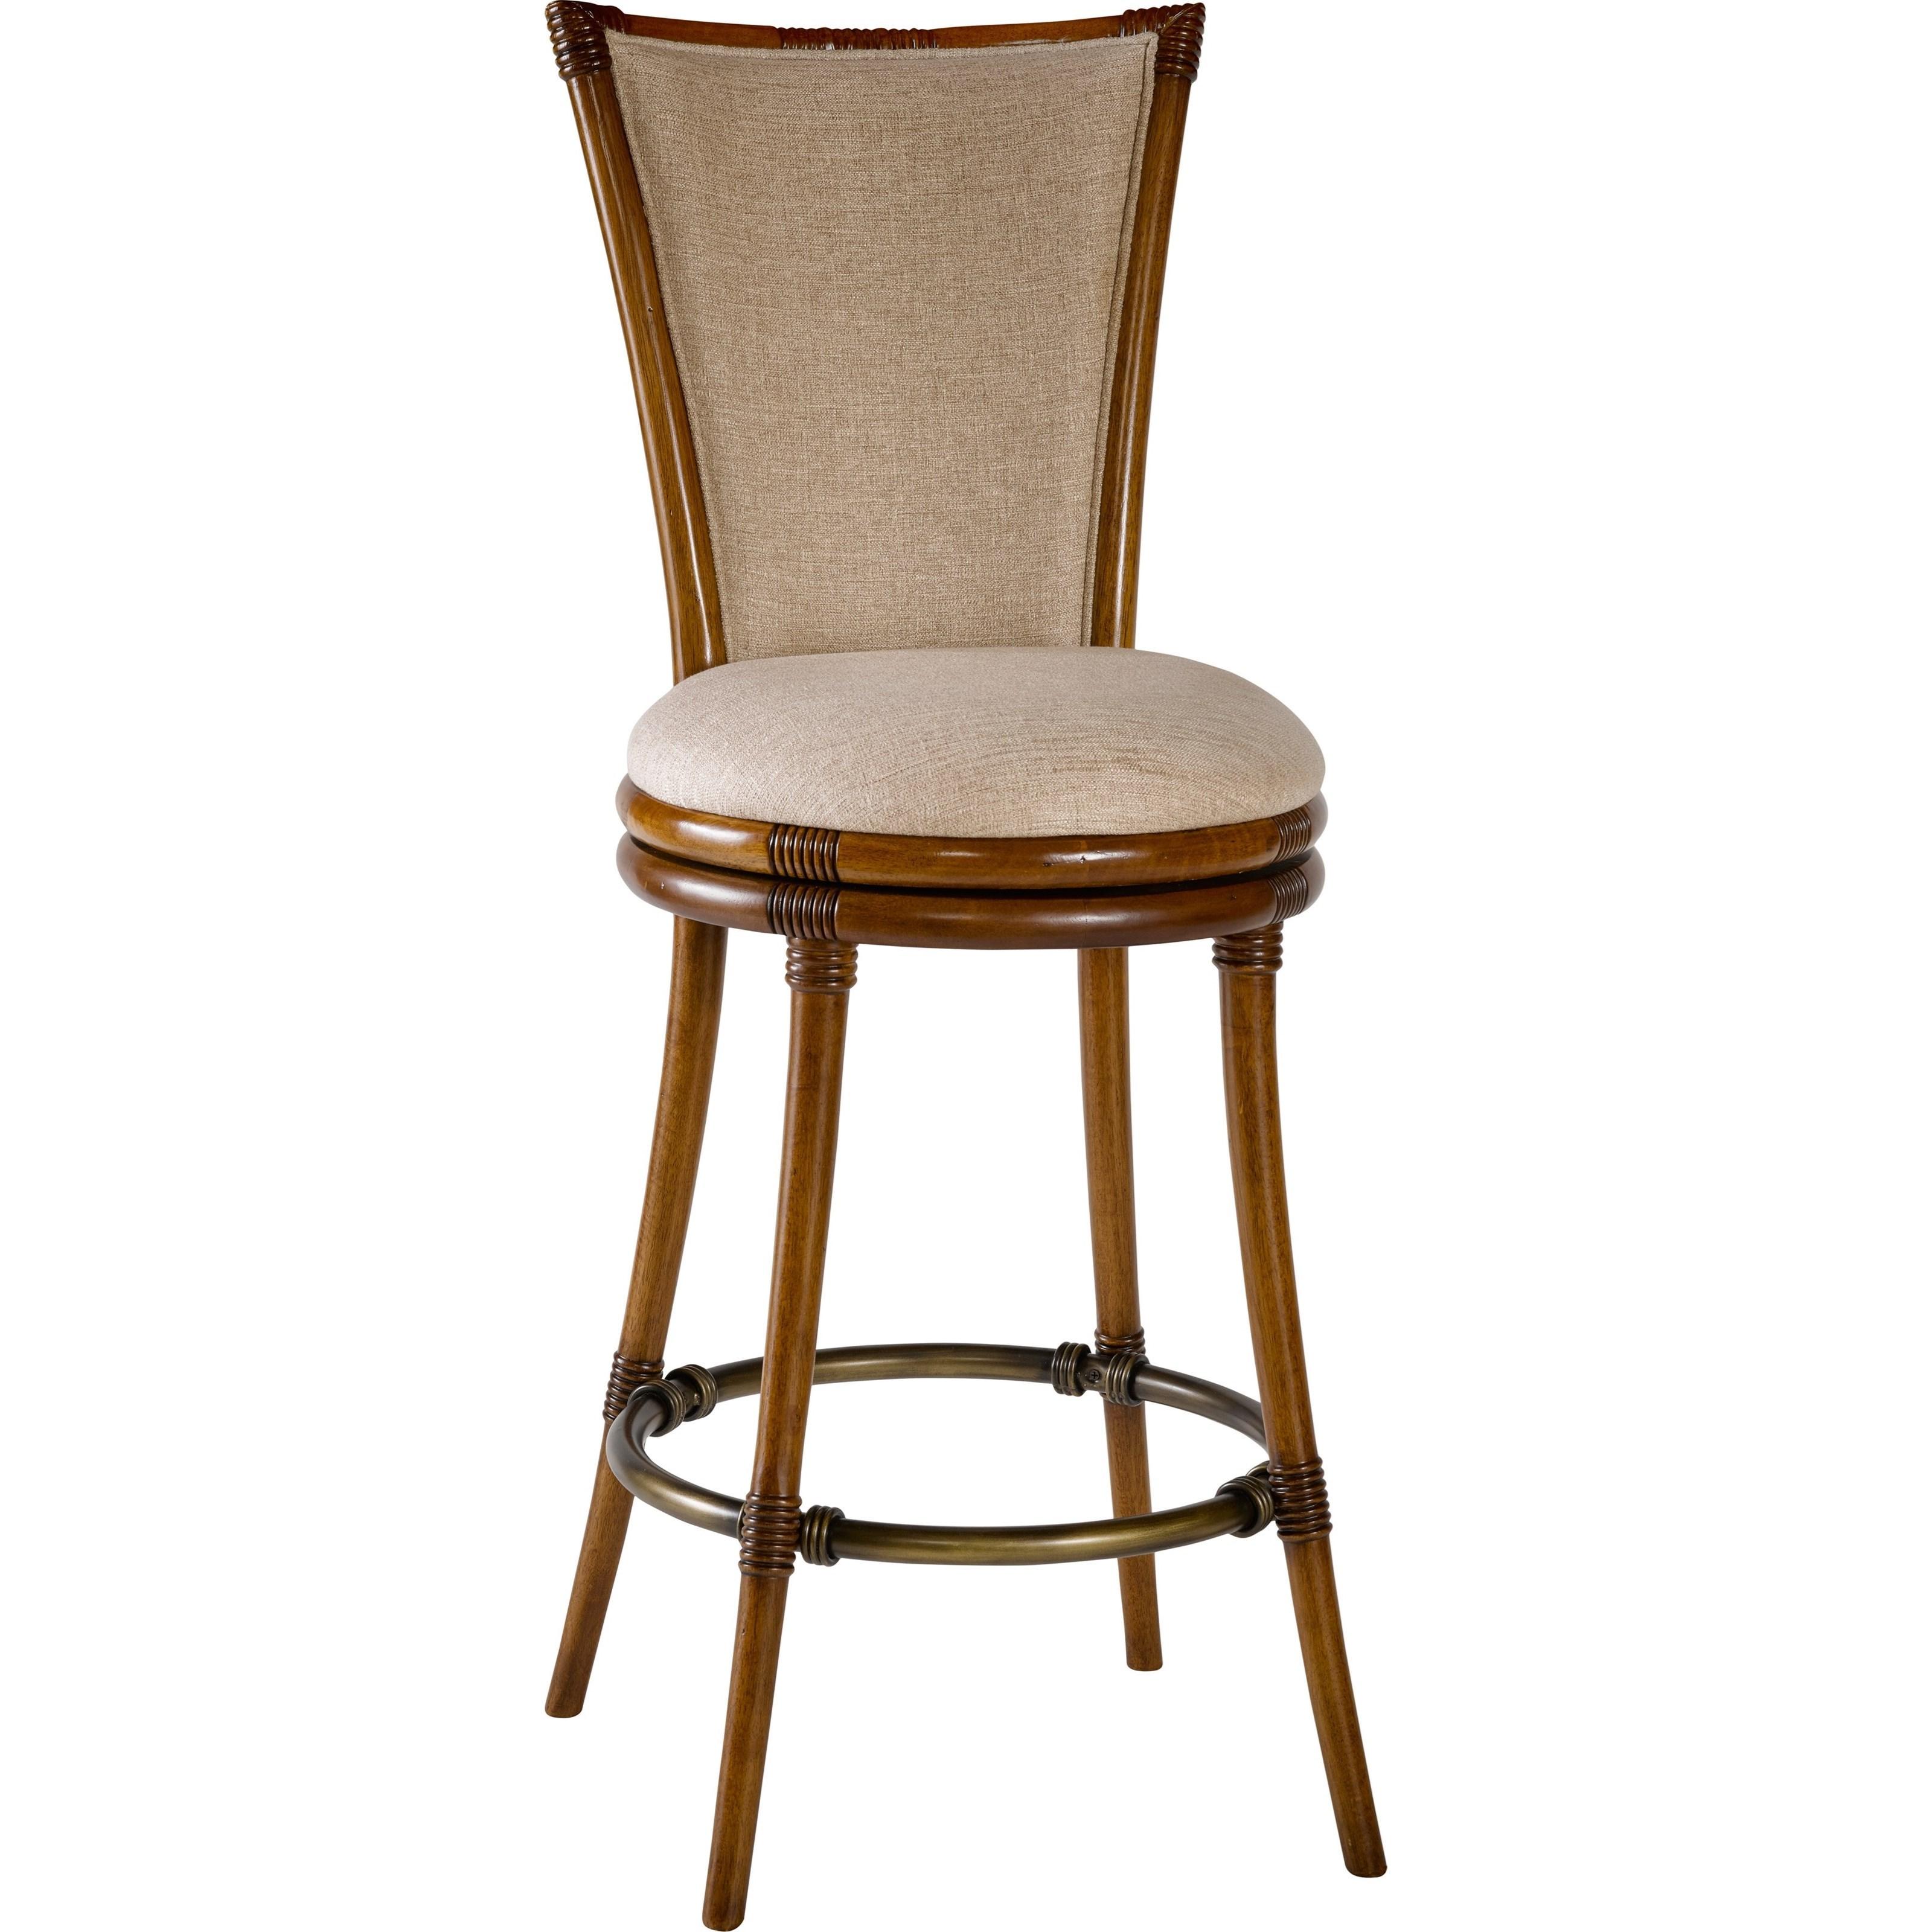 Broyhill Furniture Amalie Bay Bamboo Pub Stool - Item Number: 4548-592